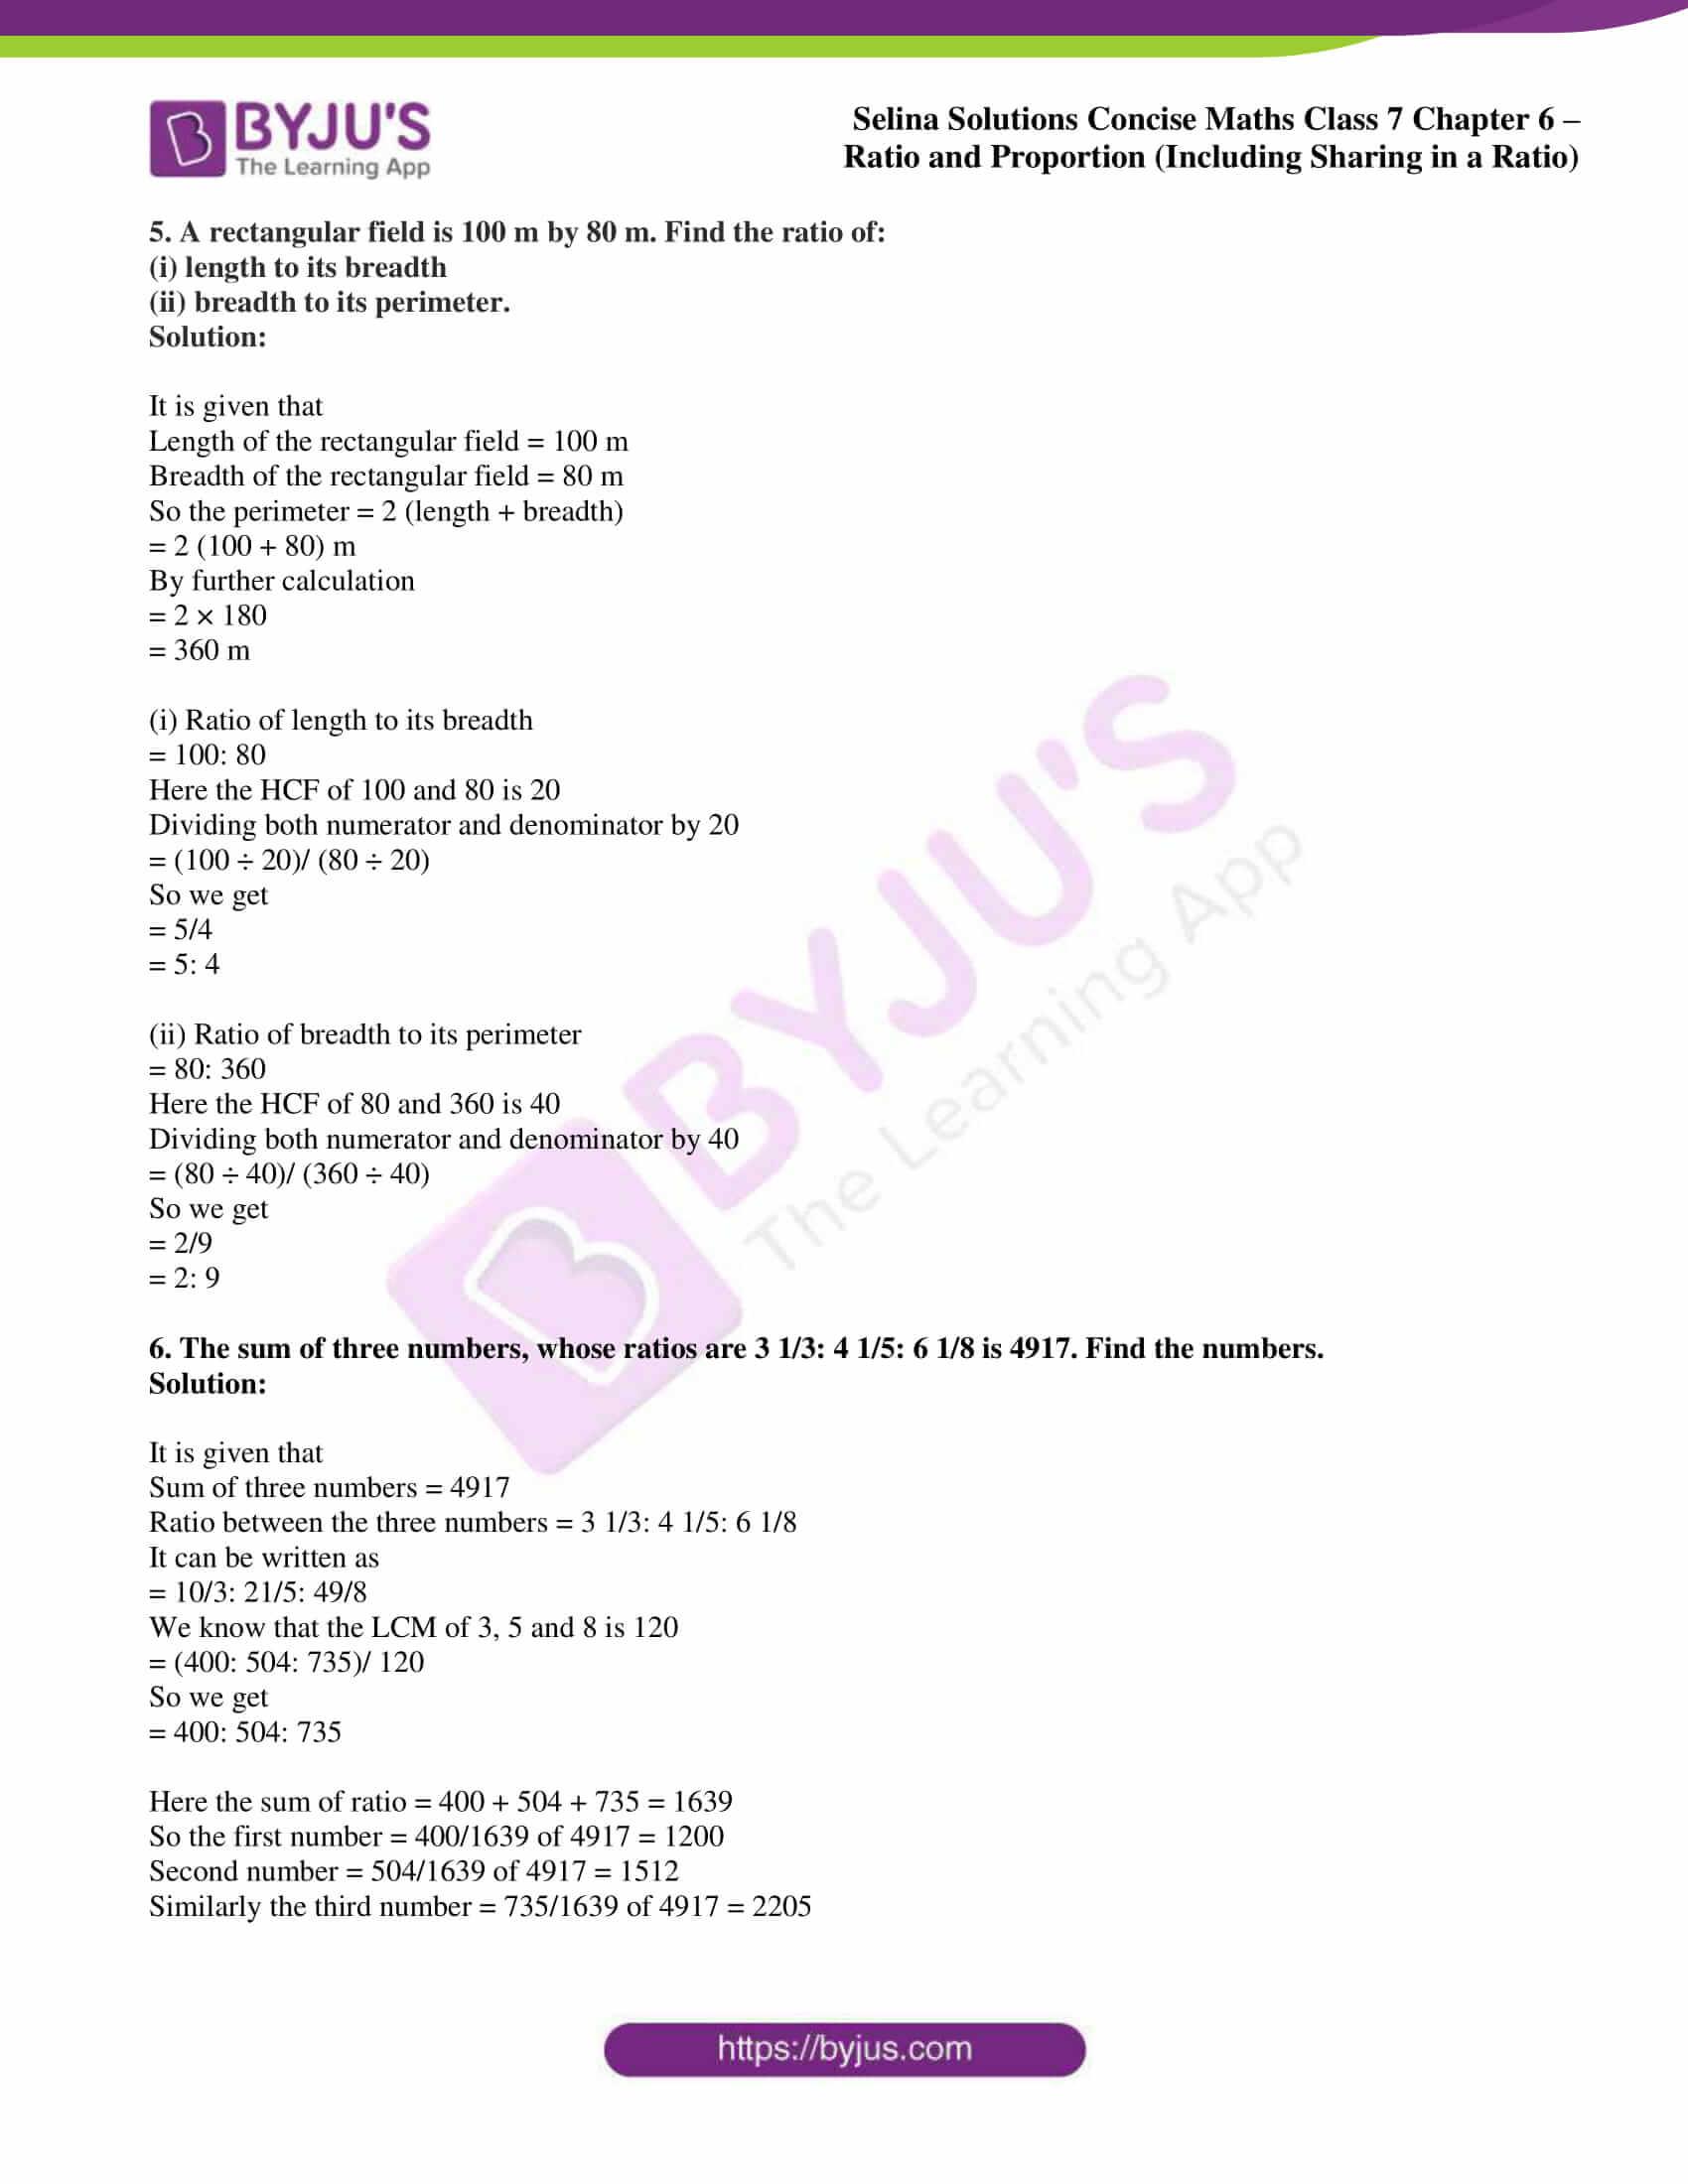 selina sol concise maths class 7 ch6 ex 6a 4